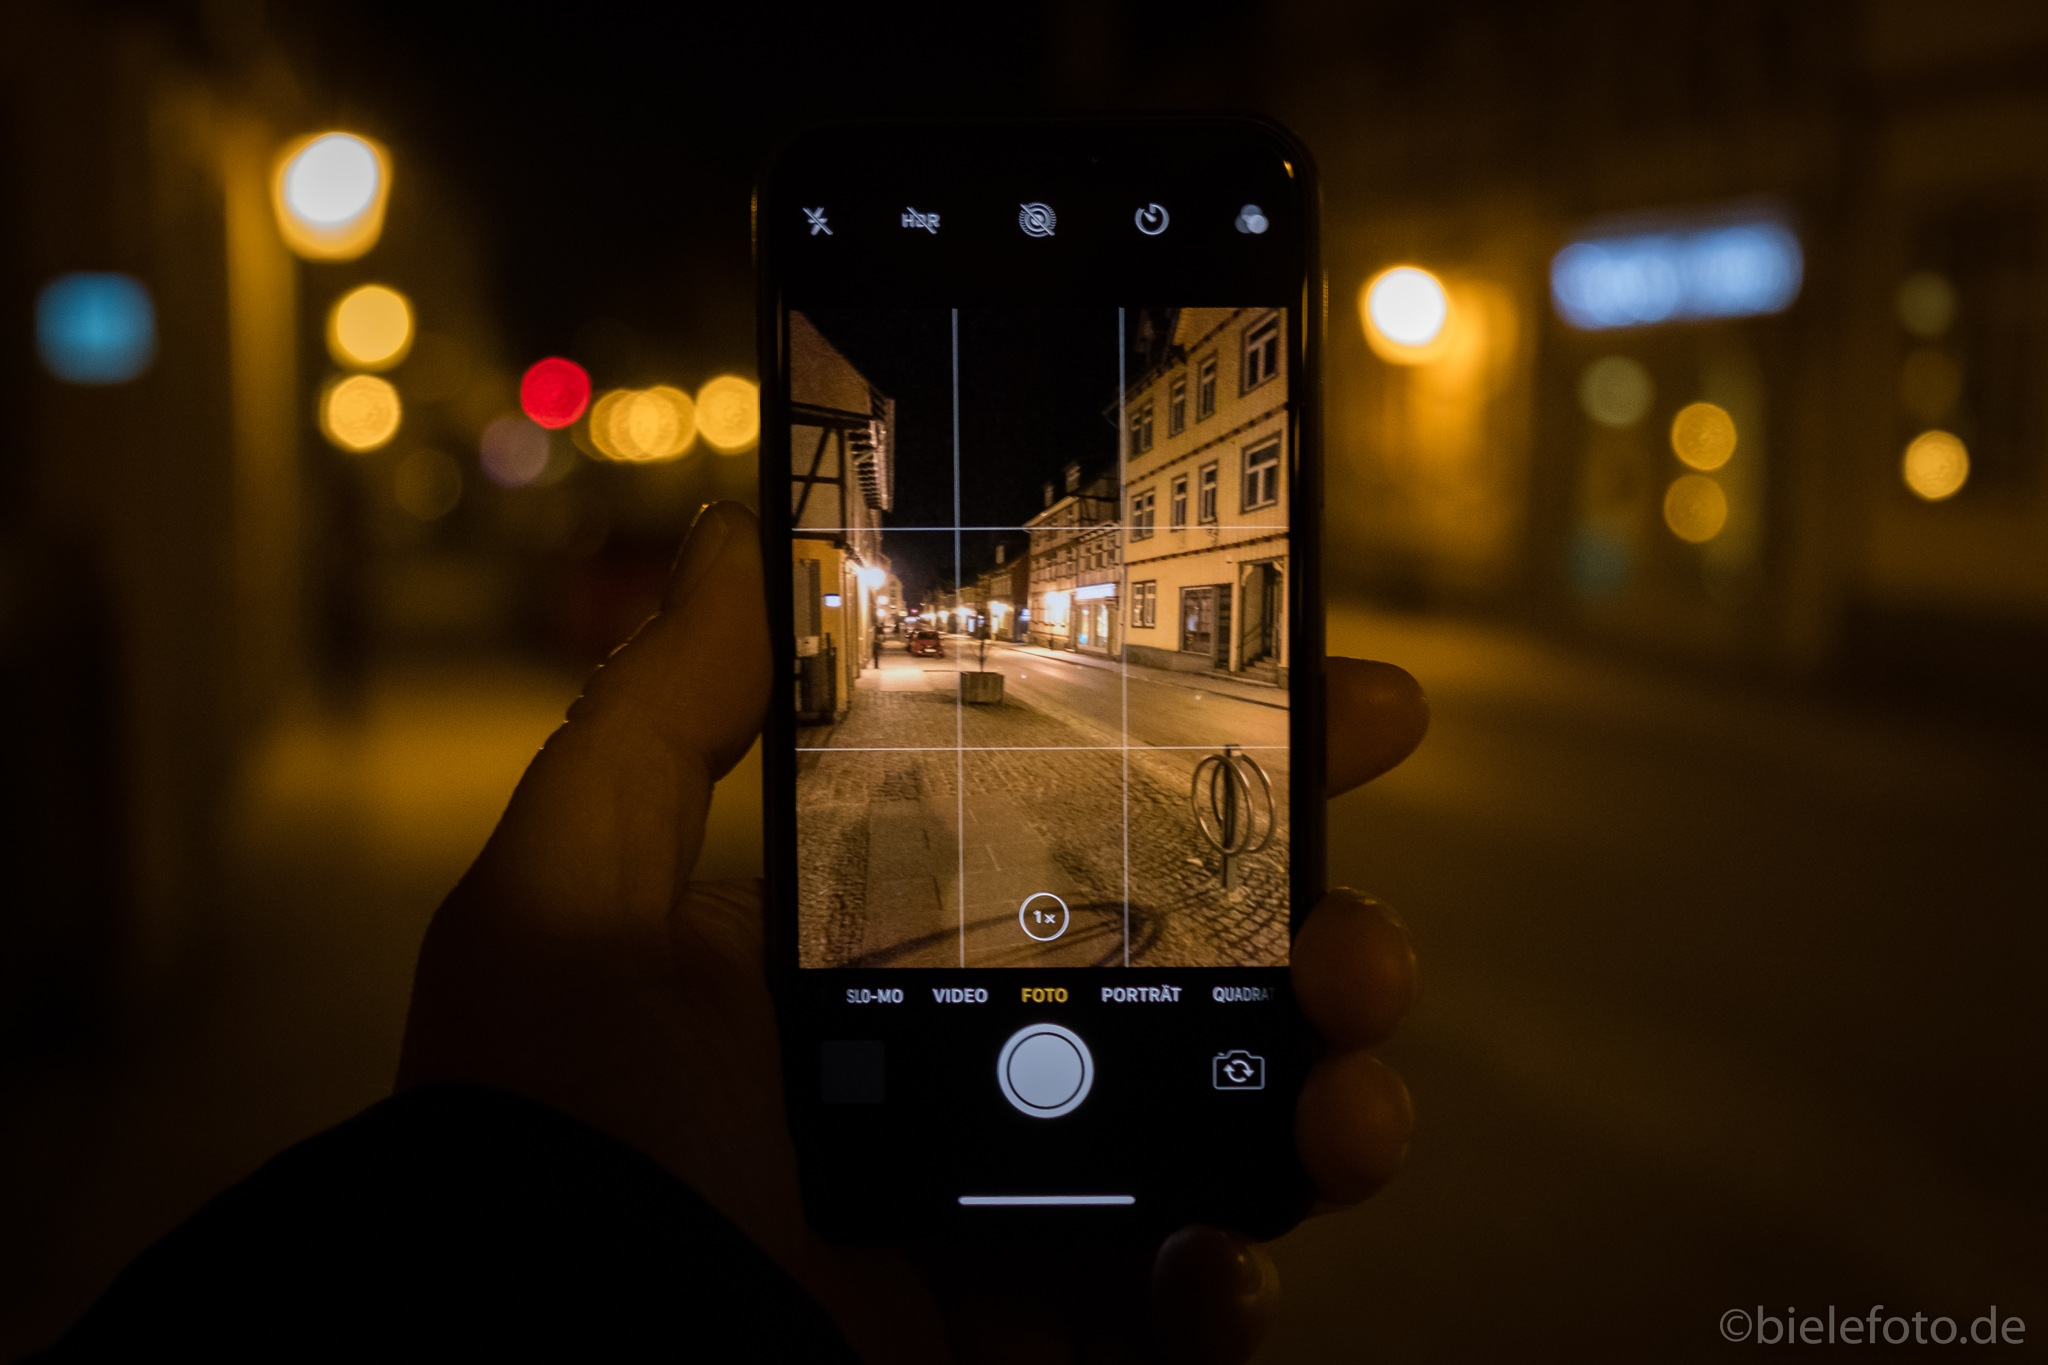 iPhone X at night  by bielefoto (Oliver Isermann)